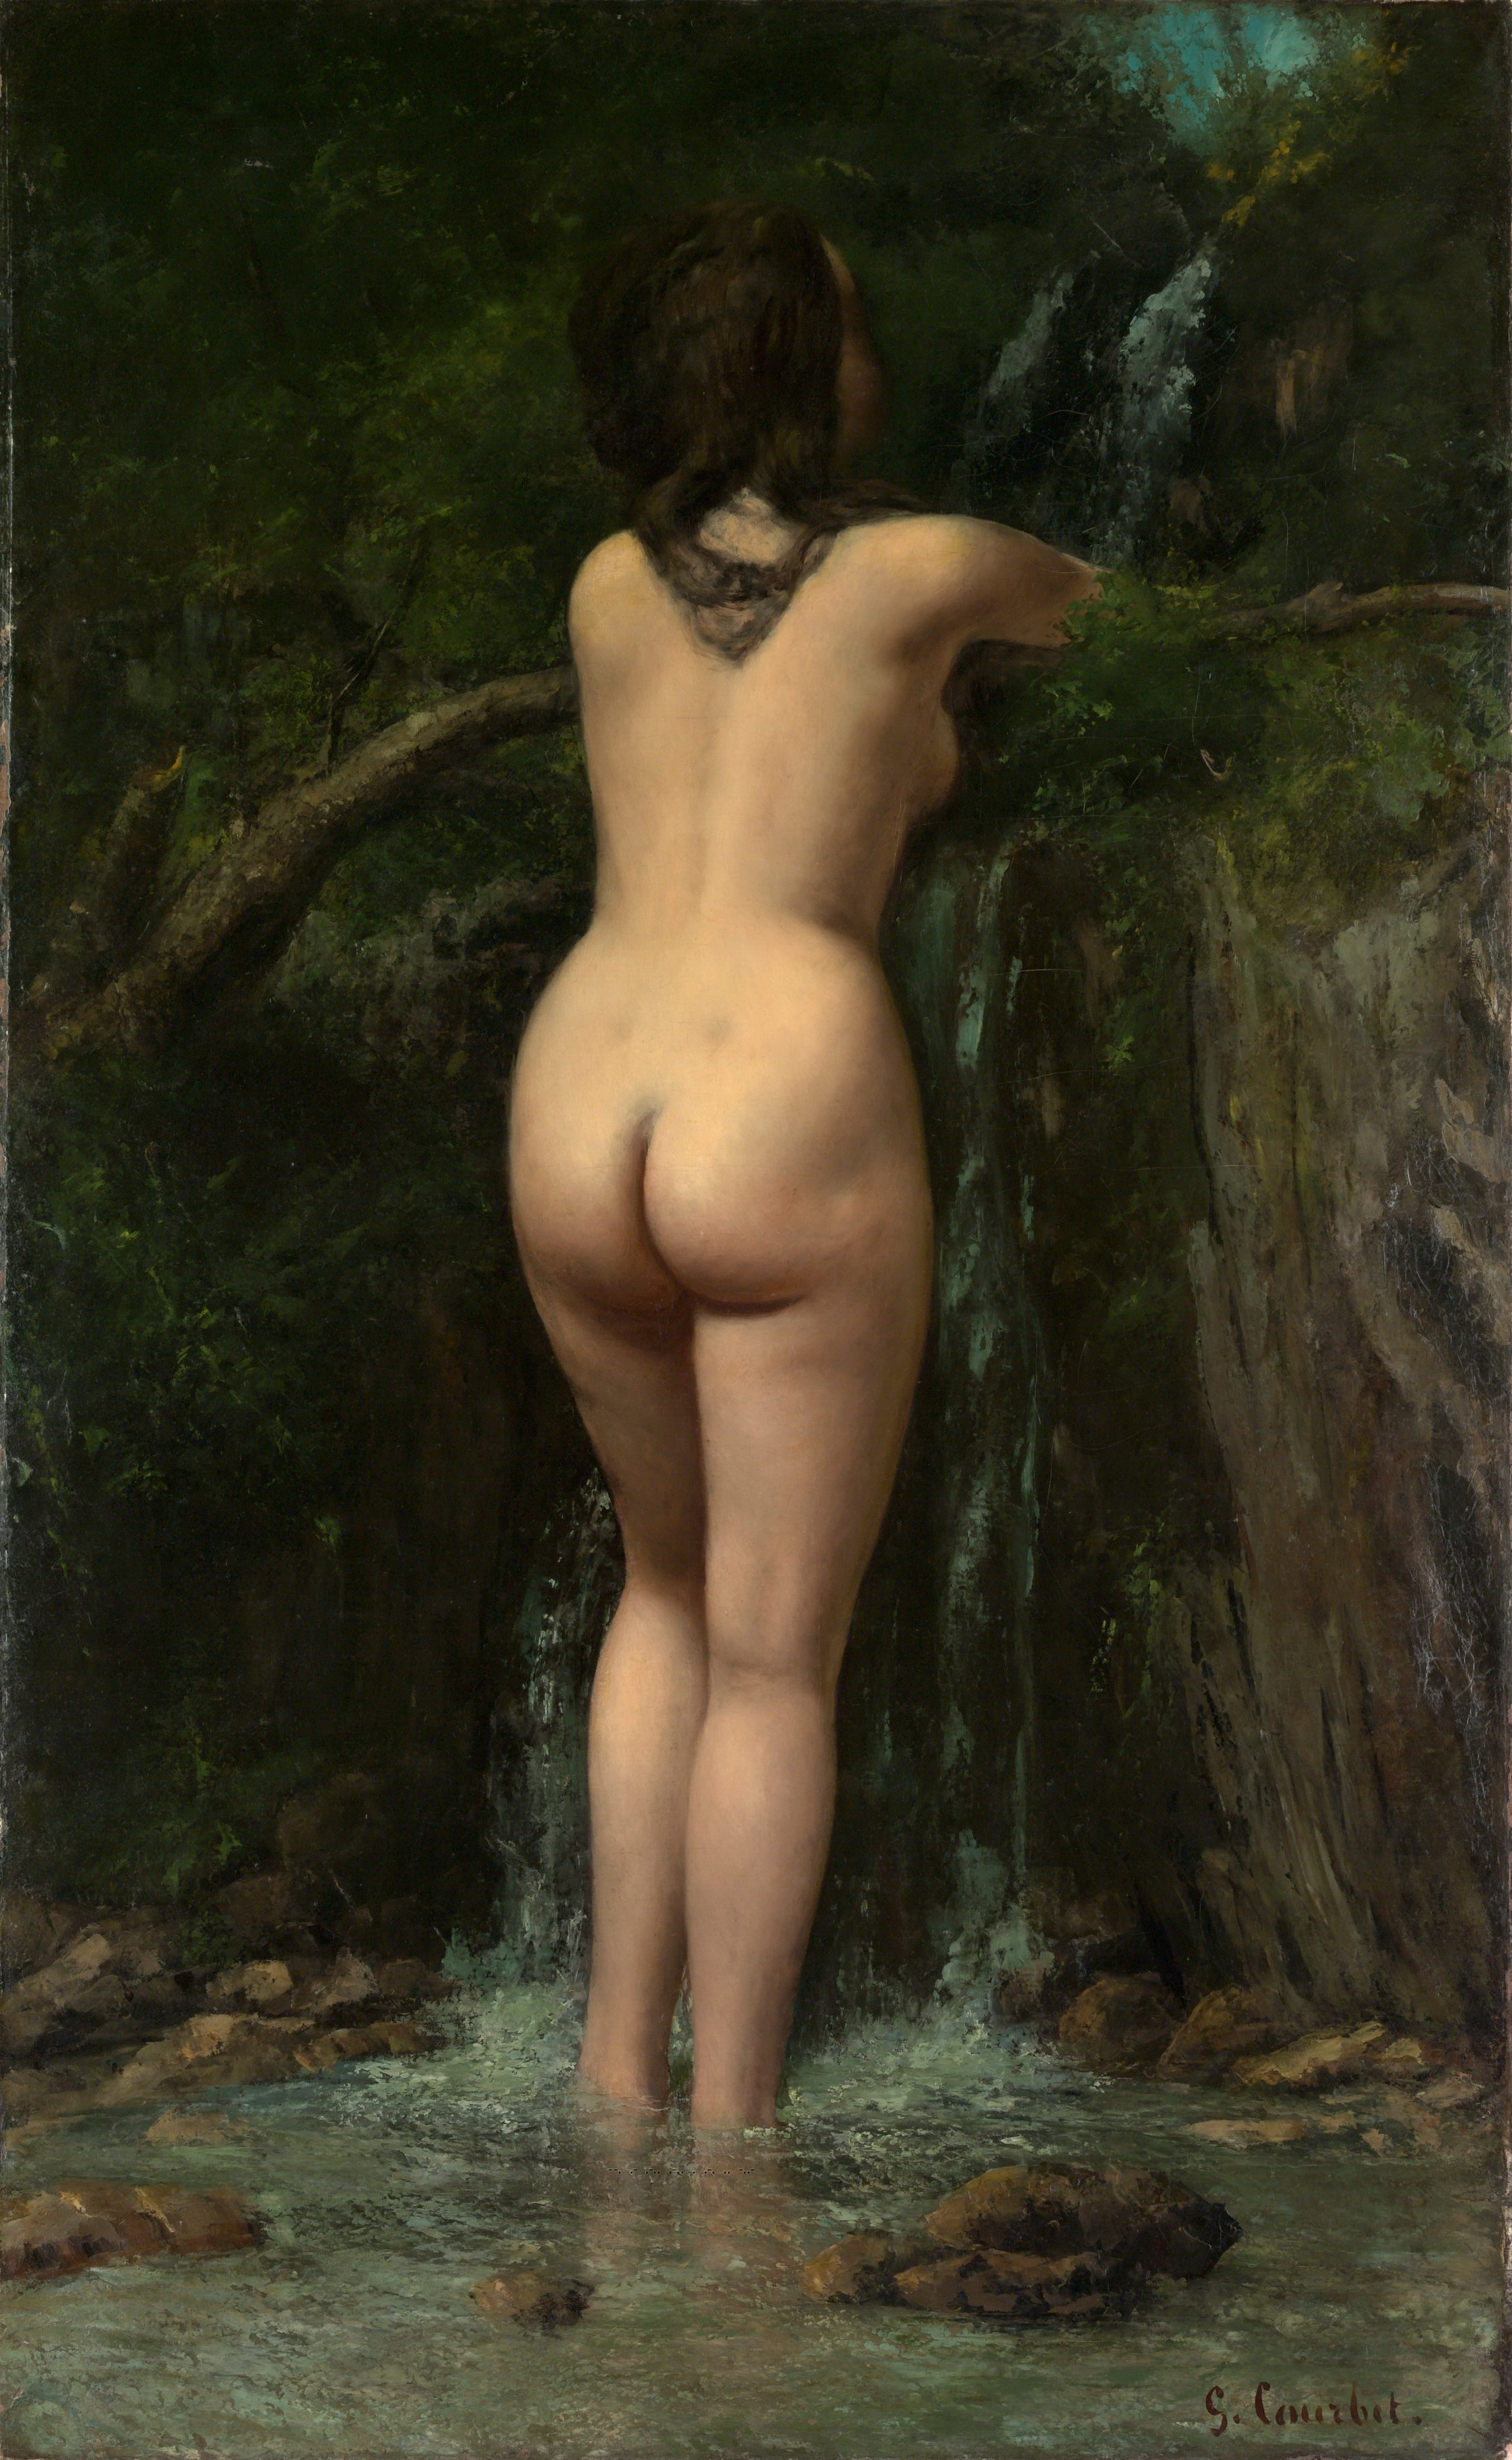 Gustave Courbet, 1819-1877. Источник. 1862. Нью-Йорк,  музей Метрополитен